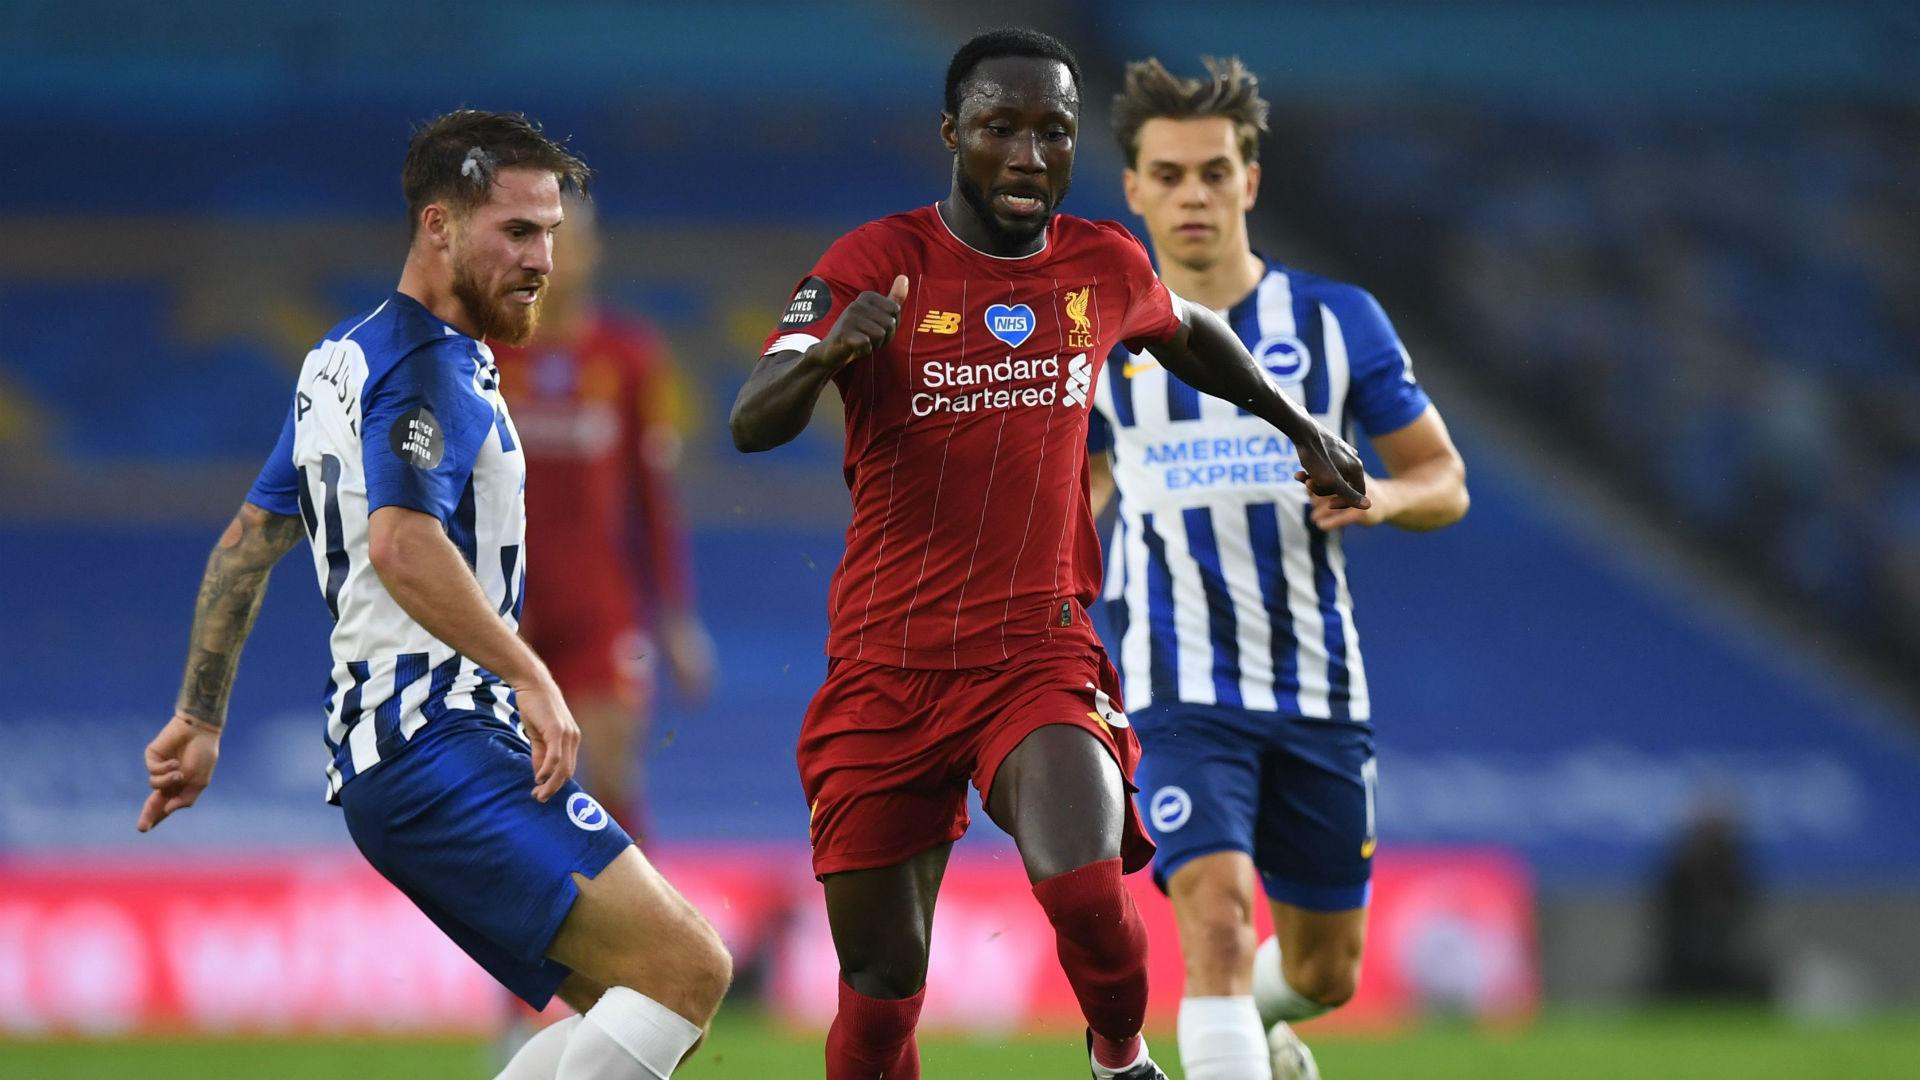 Keita is getting better and better – Klopp praises Liverpool midfielder